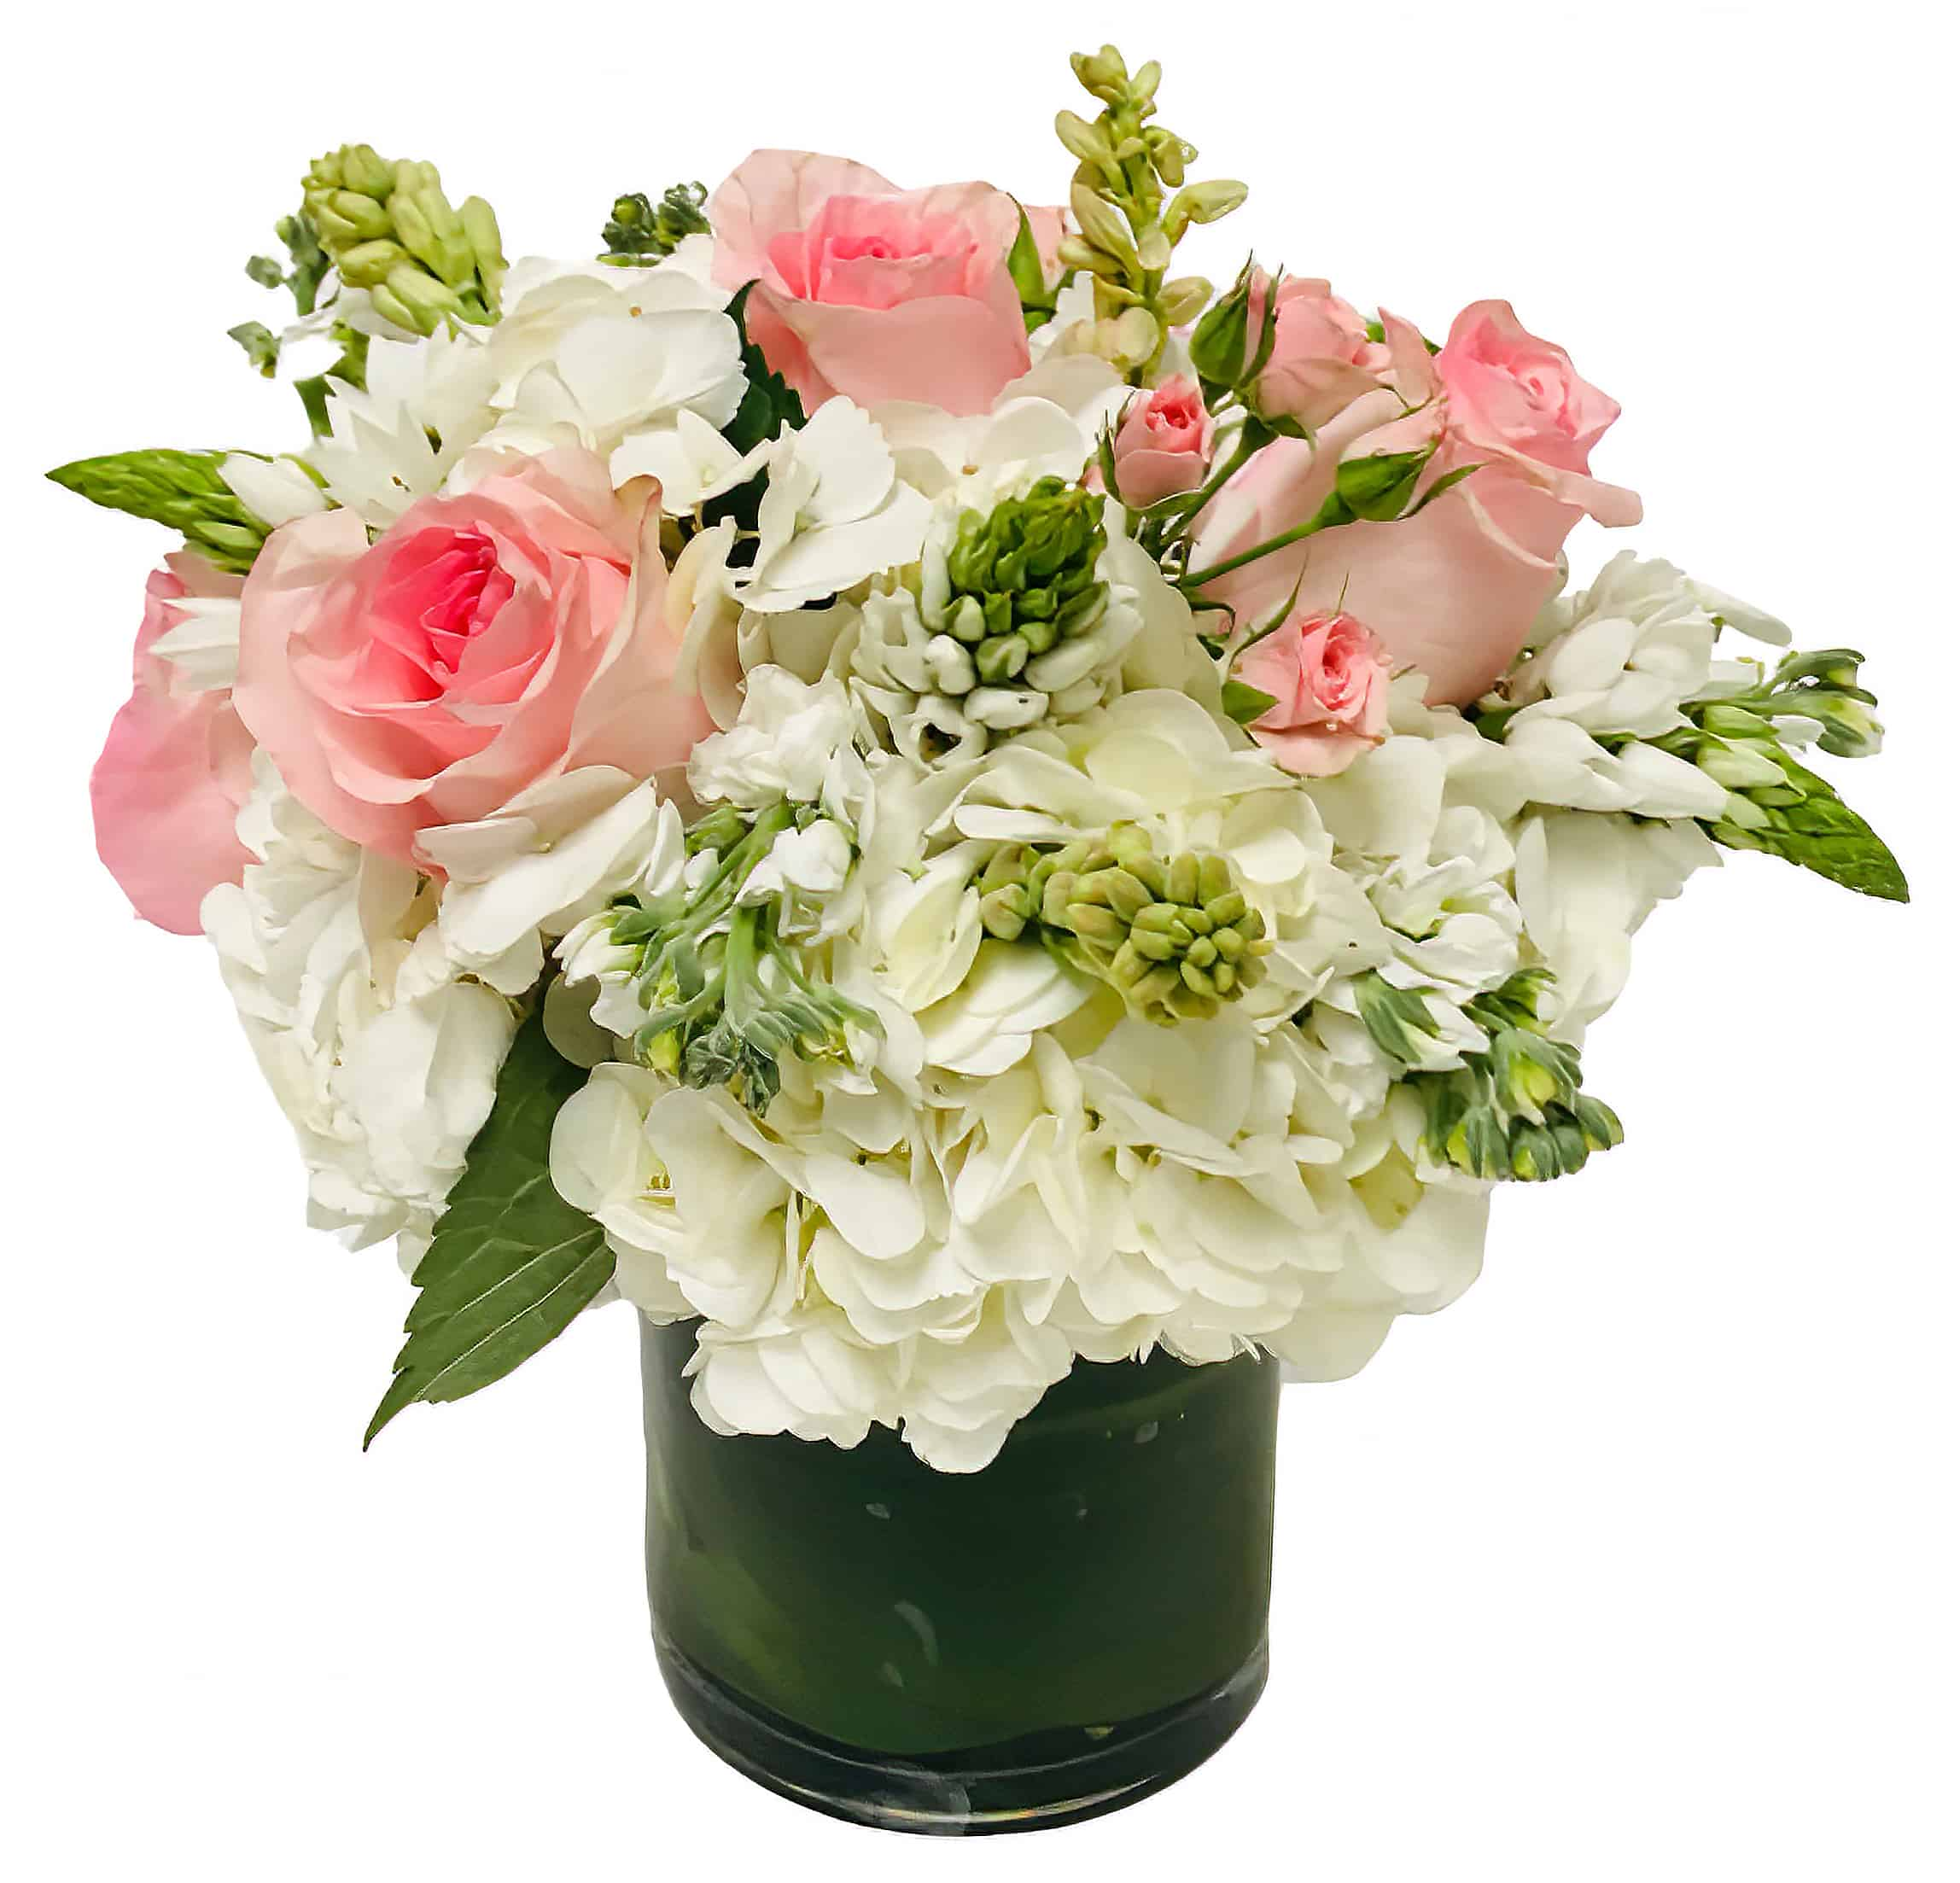 Celadon and Ivory Flower Arrangement